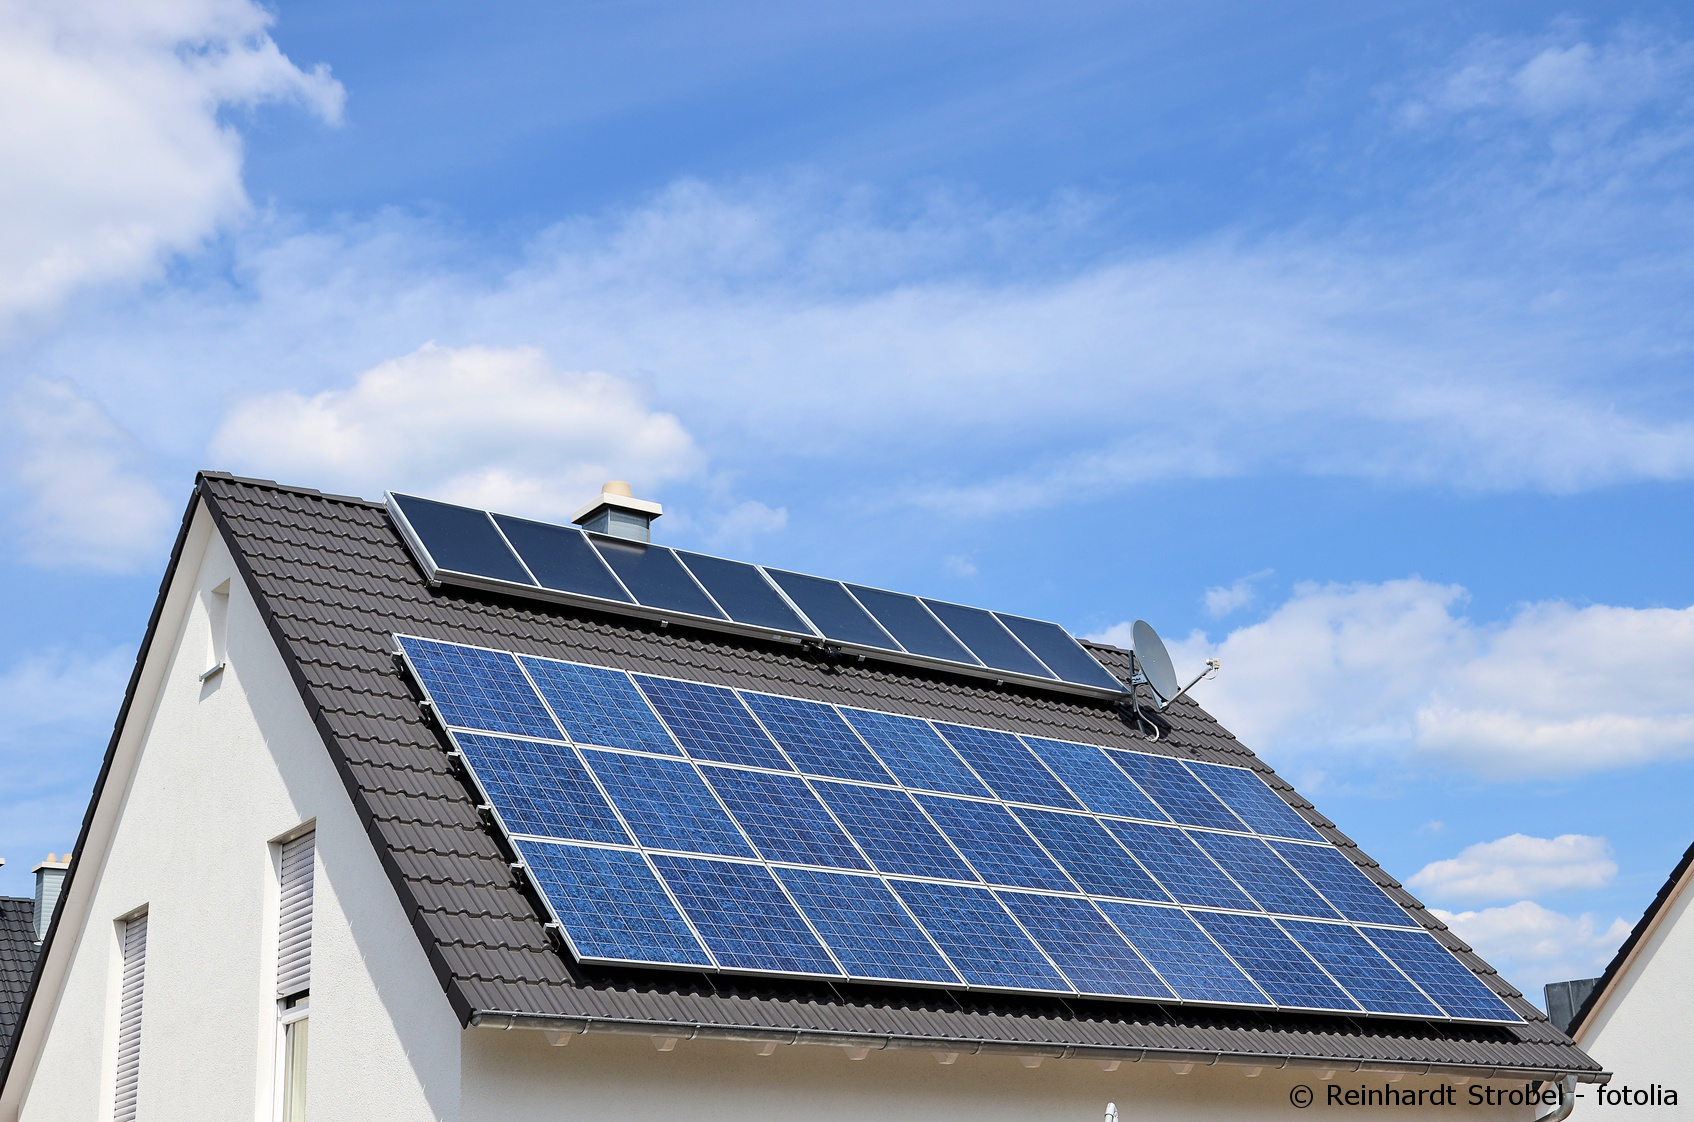 solarthermie die bessere photovoltaik sanit r. Black Bedroom Furniture Sets. Home Design Ideas